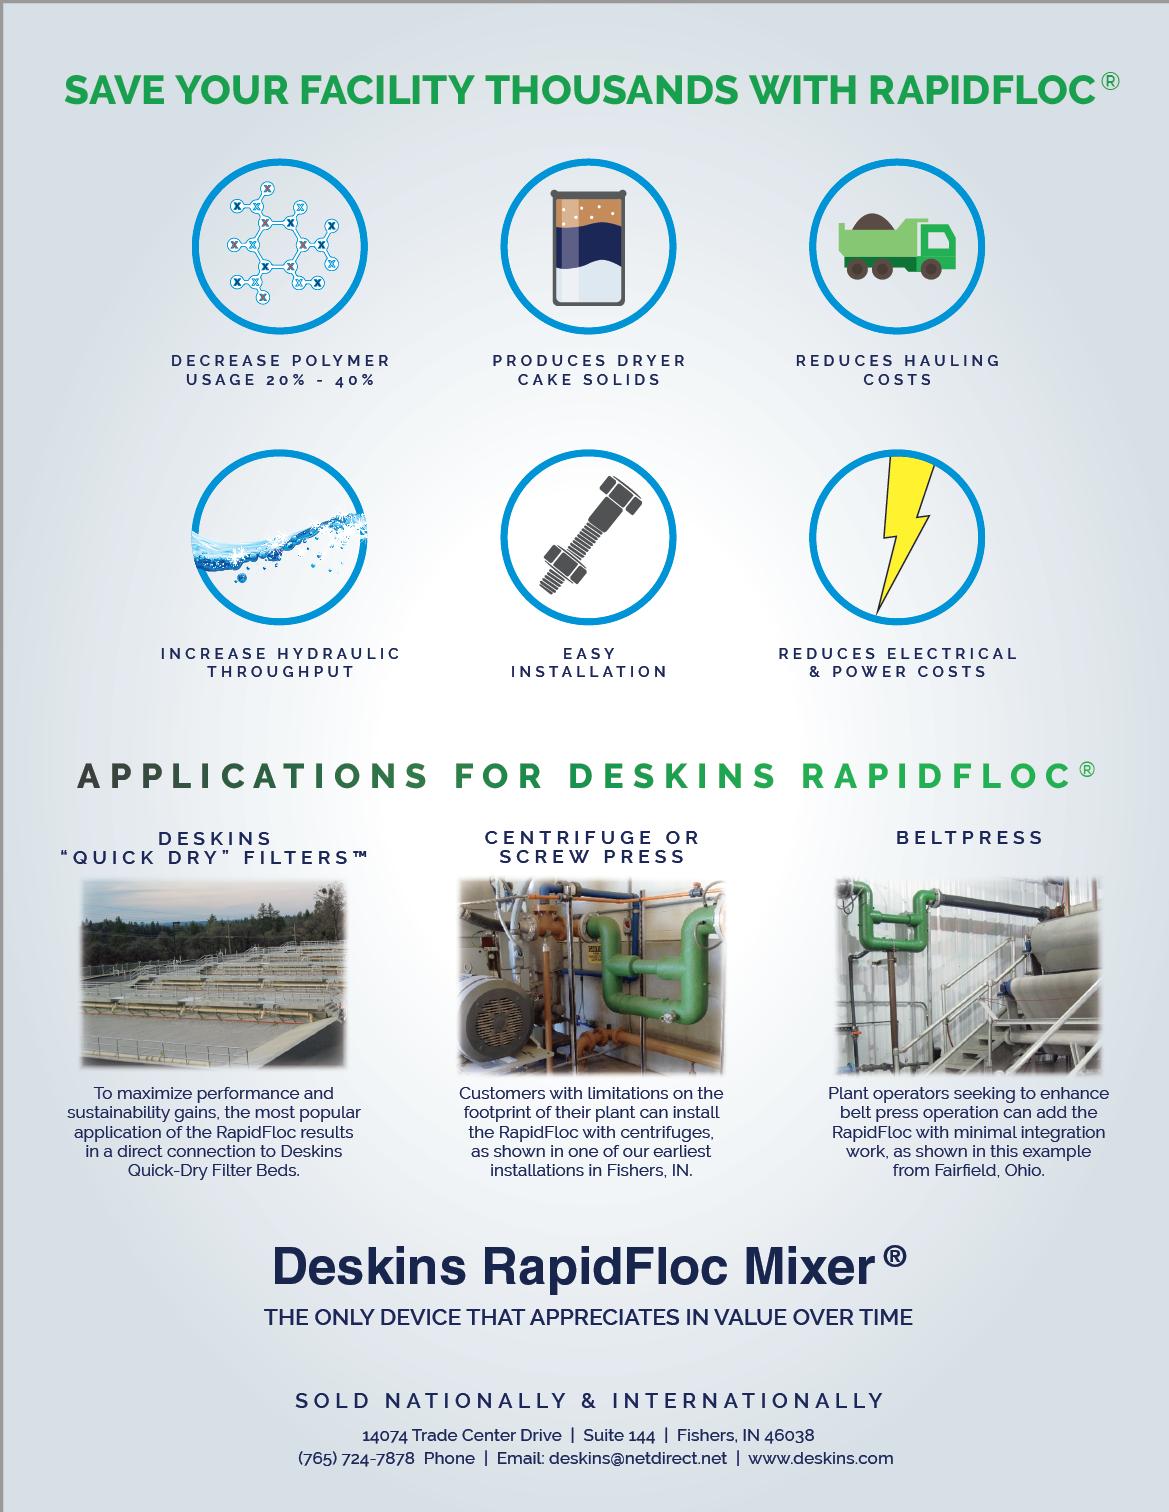 rapidfloc snip2.PNG